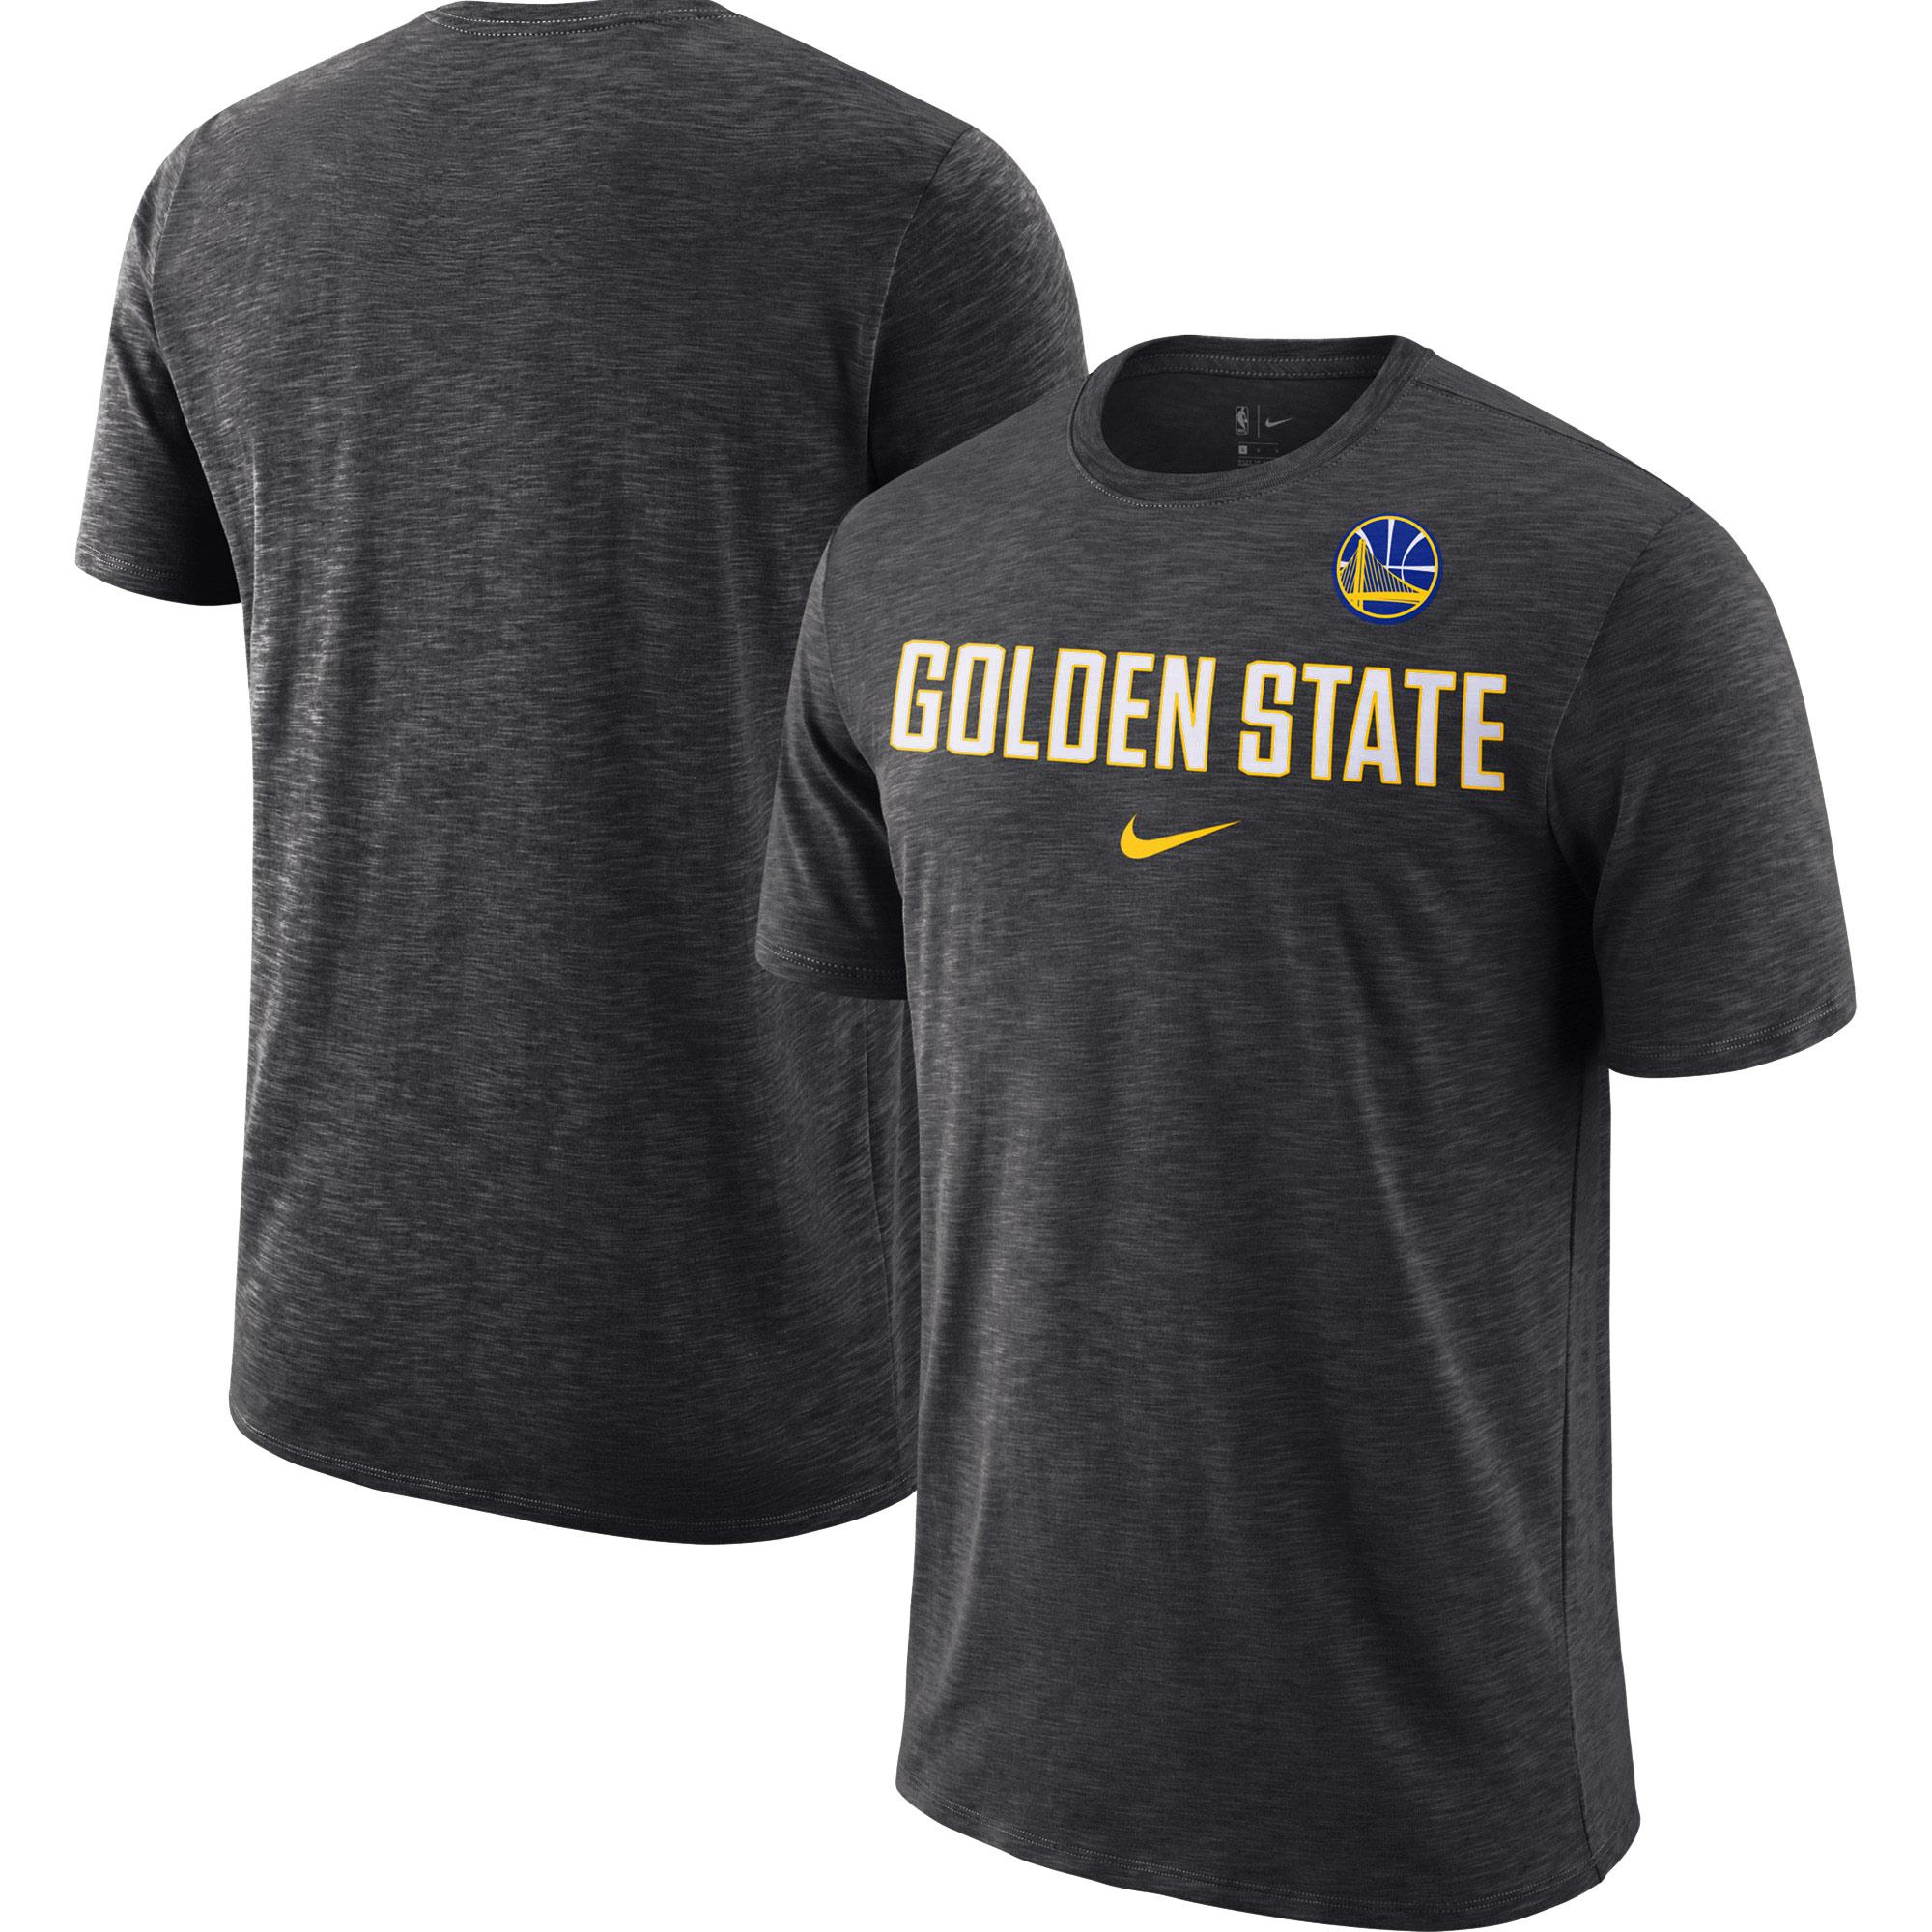 Golden State Warriors Nike Essential Facility Slub Performance T-Shirt - Heathered Gray